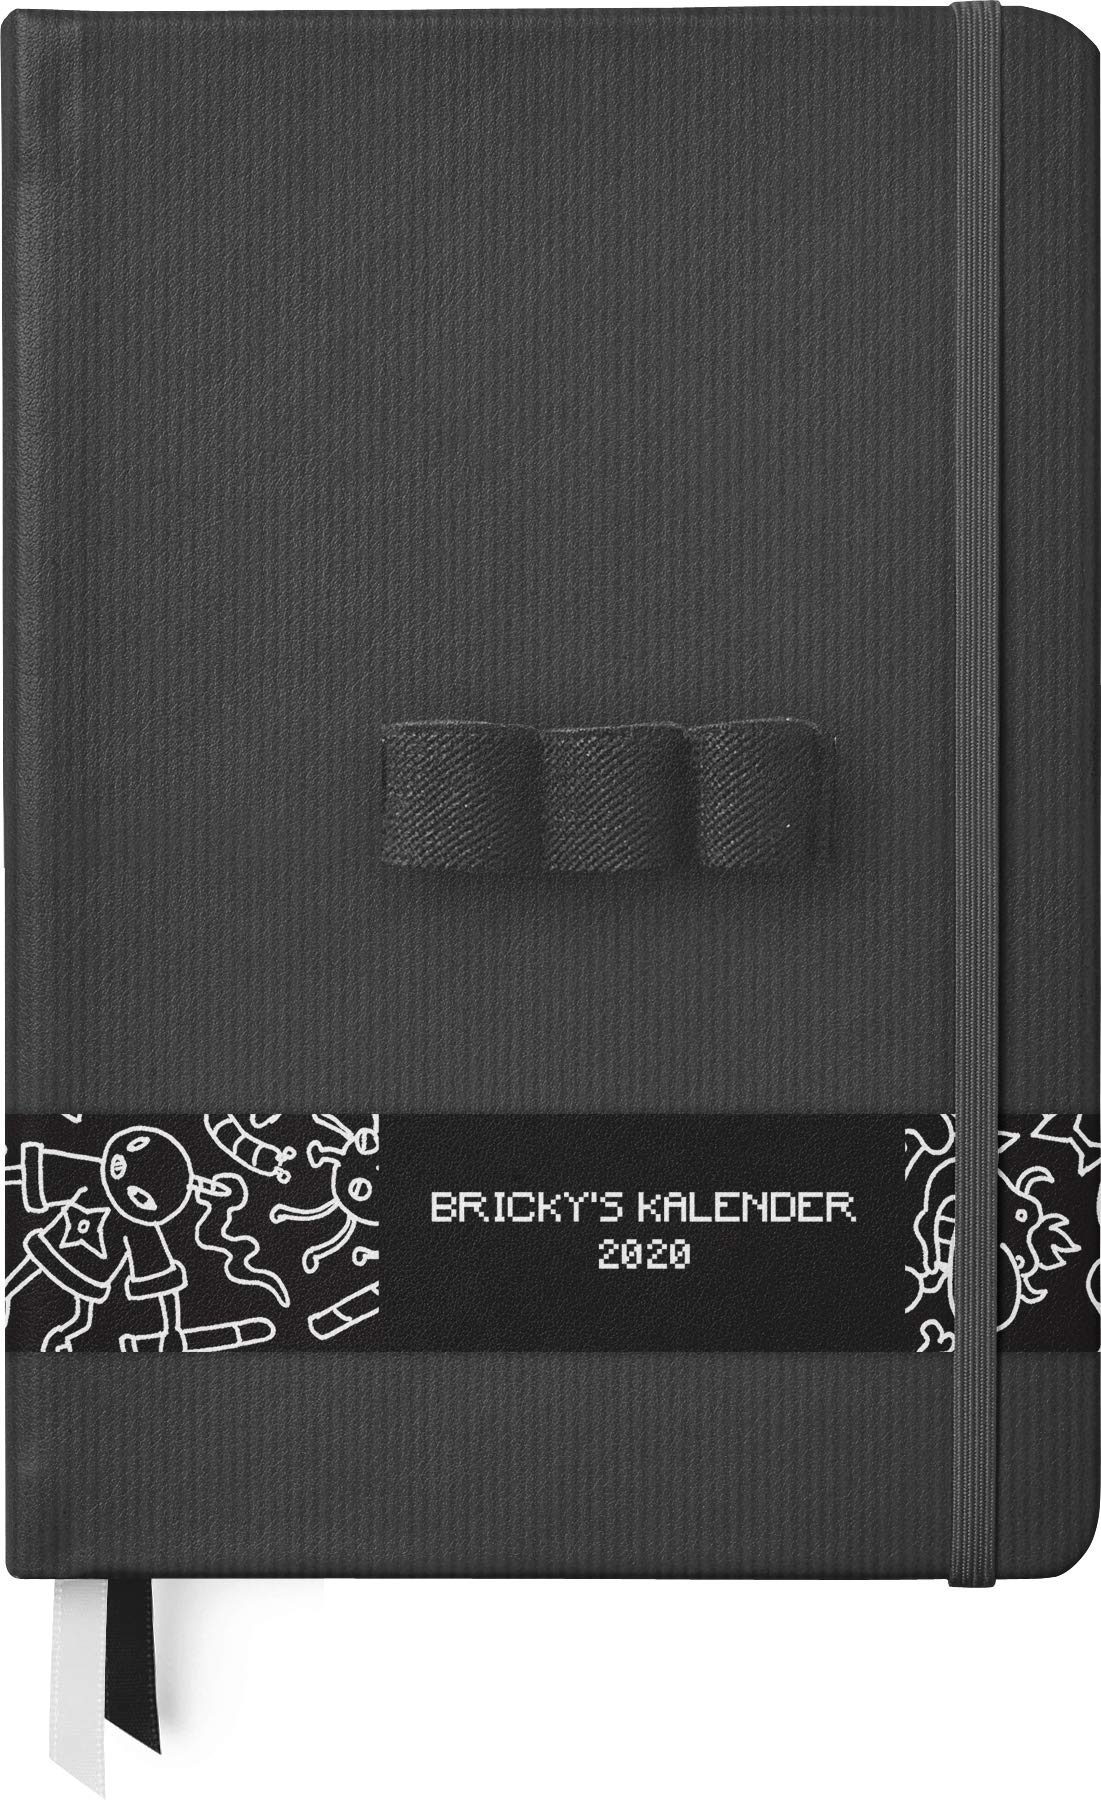 Bricky's Collection   Der Kalender 2020